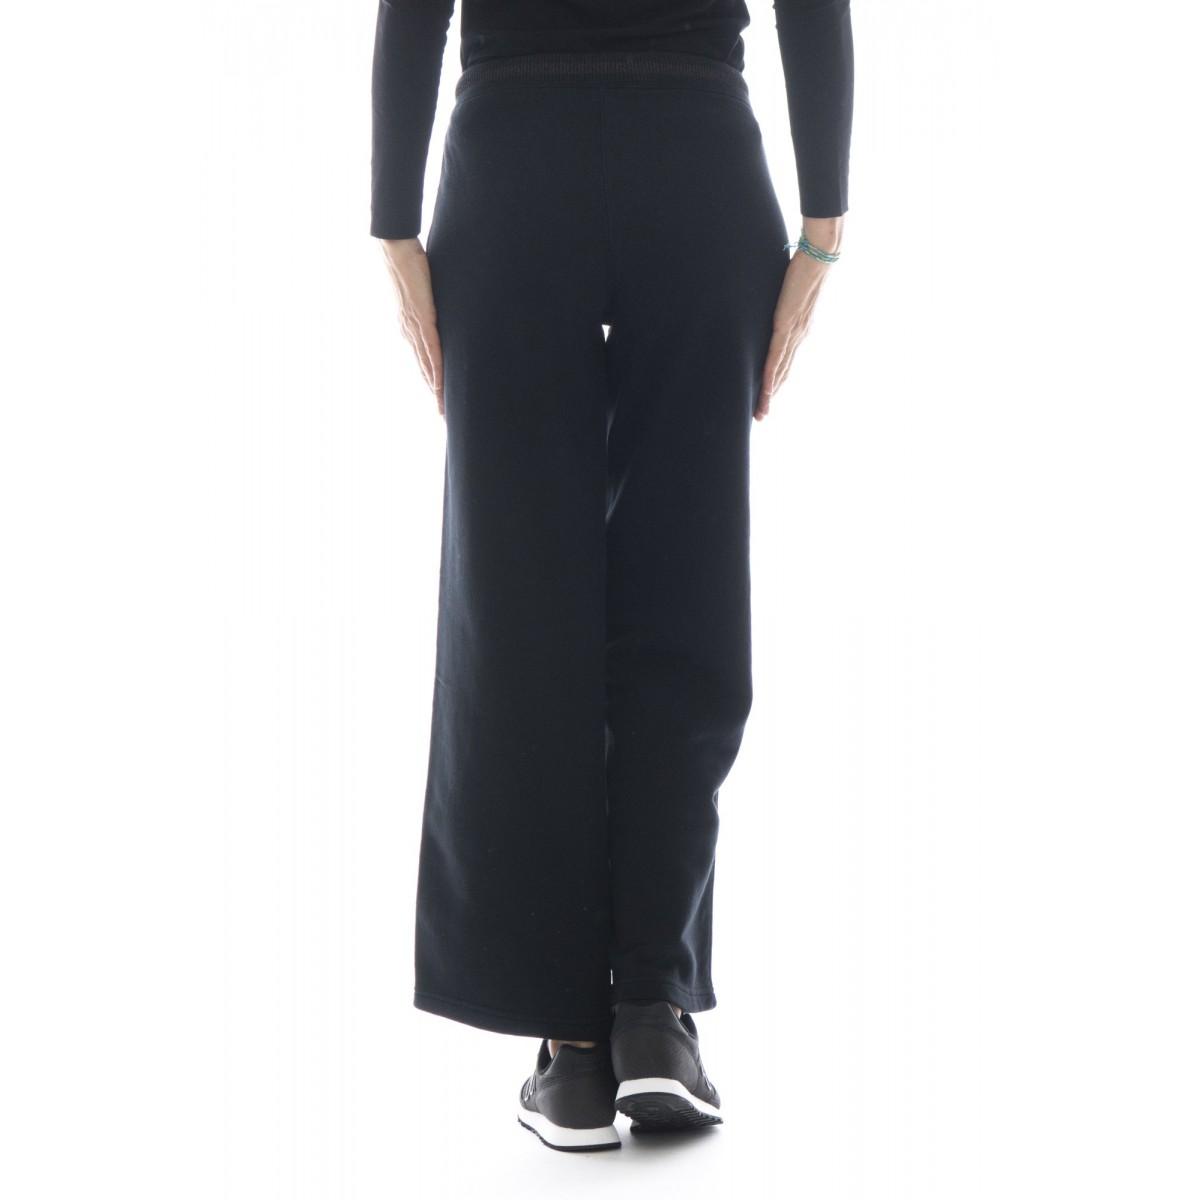 Pantalone donna - 27235 pantalone tuta largo